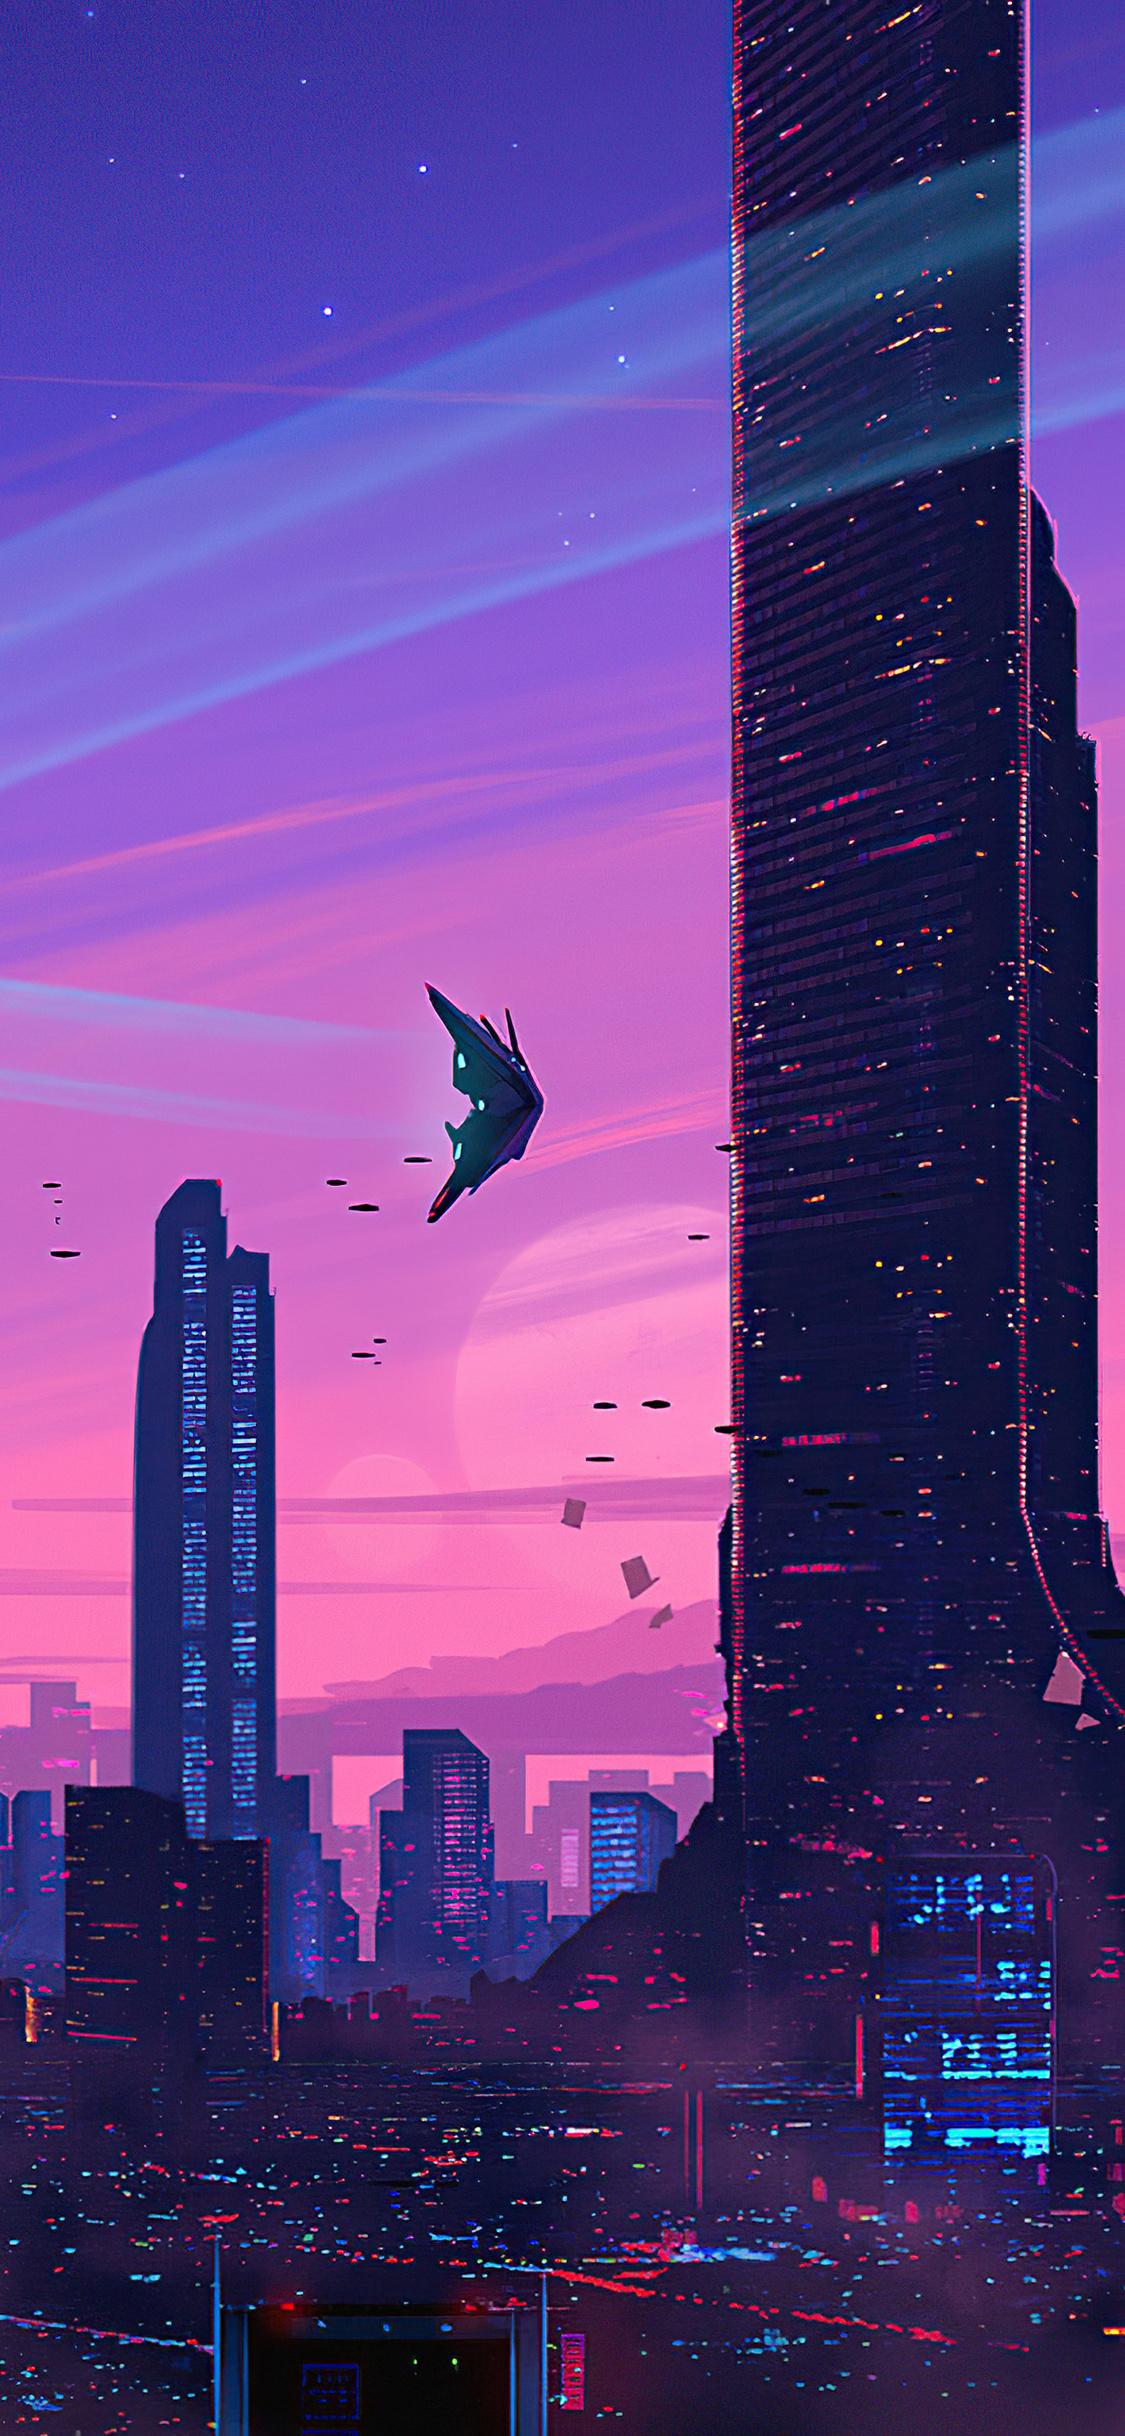 evening-rush-in-scifi-city-5k-d0.jpg